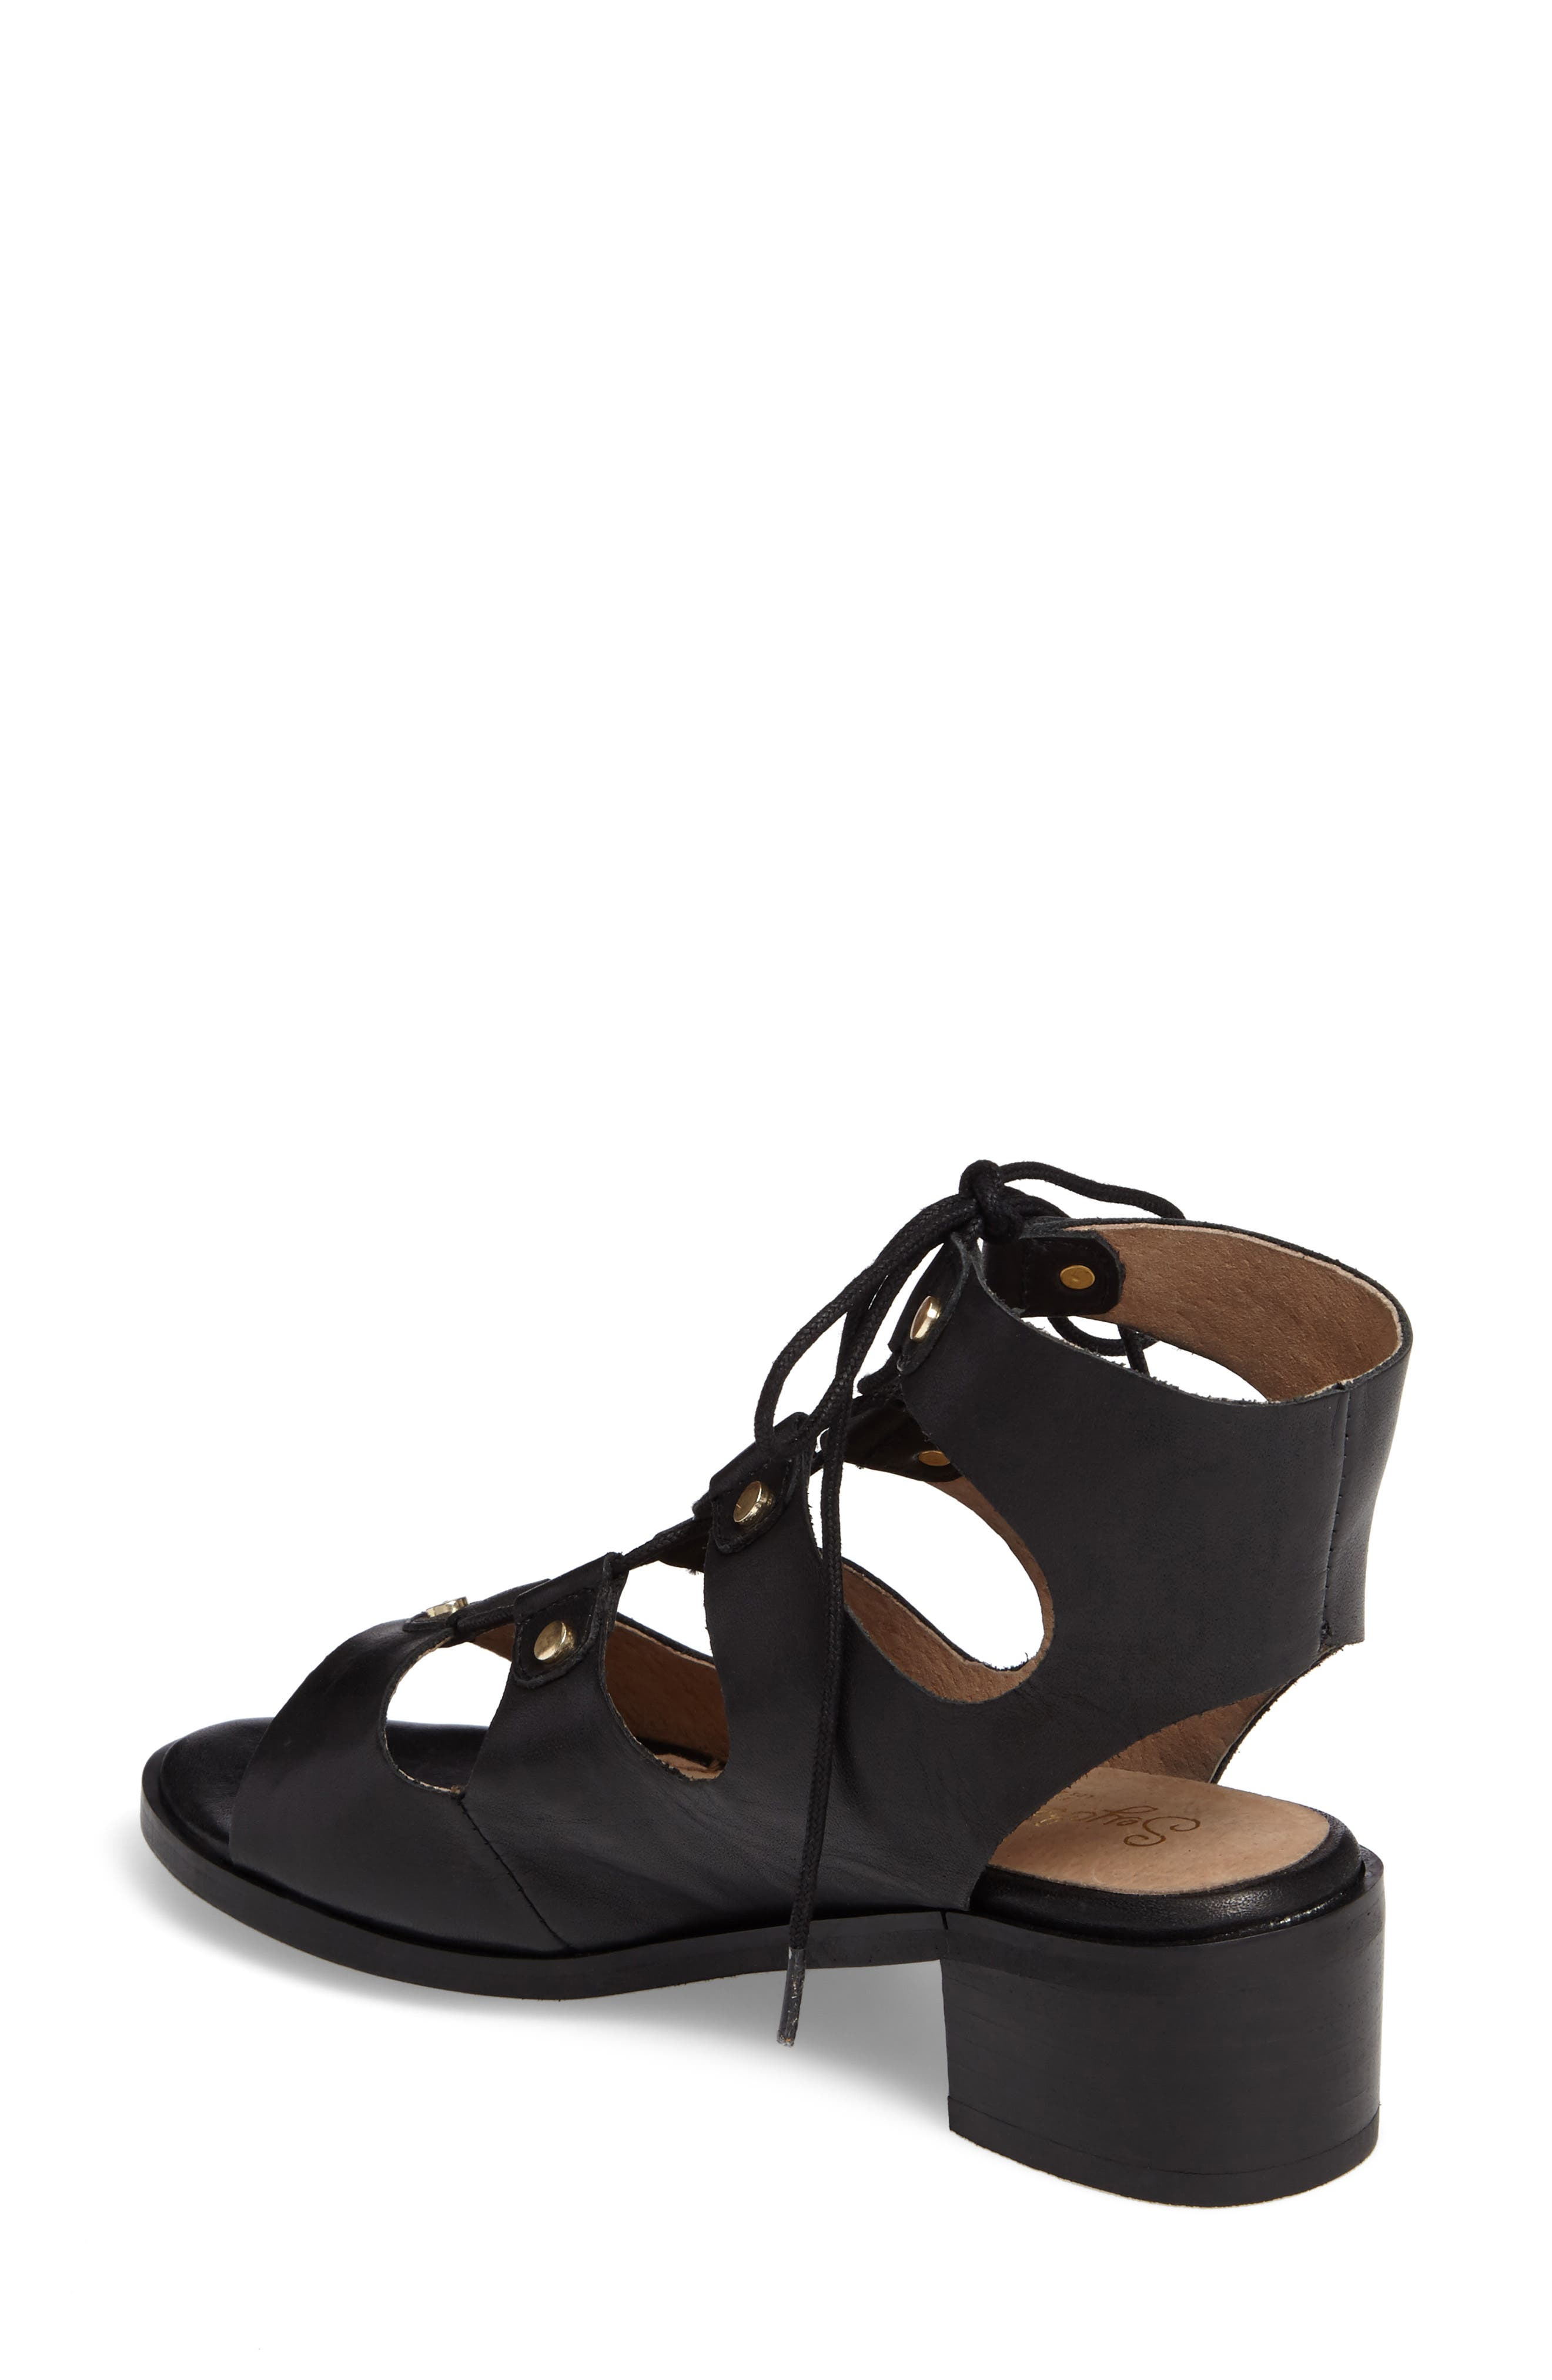 Alternate Image 2  - Seychelles Love Affair Lace-Up Sandal (Women)